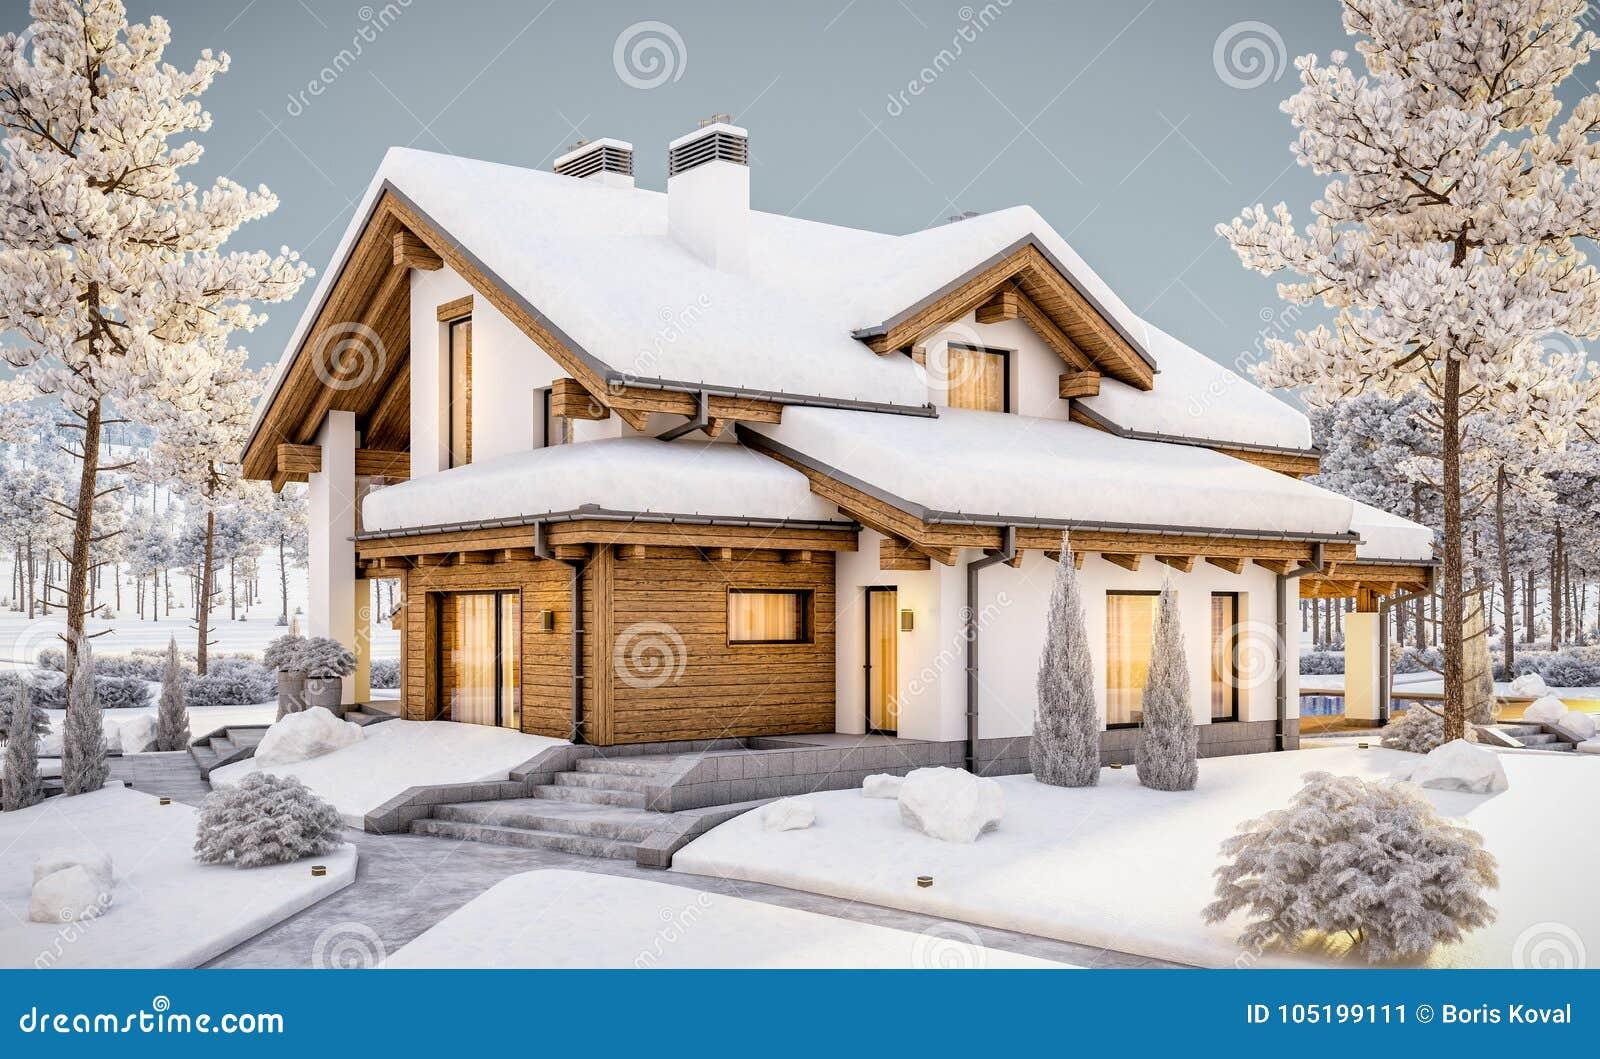 3d rendering of modern cozy house in chalet style stock illustration illustration of patio - Moderner chalet stil ...